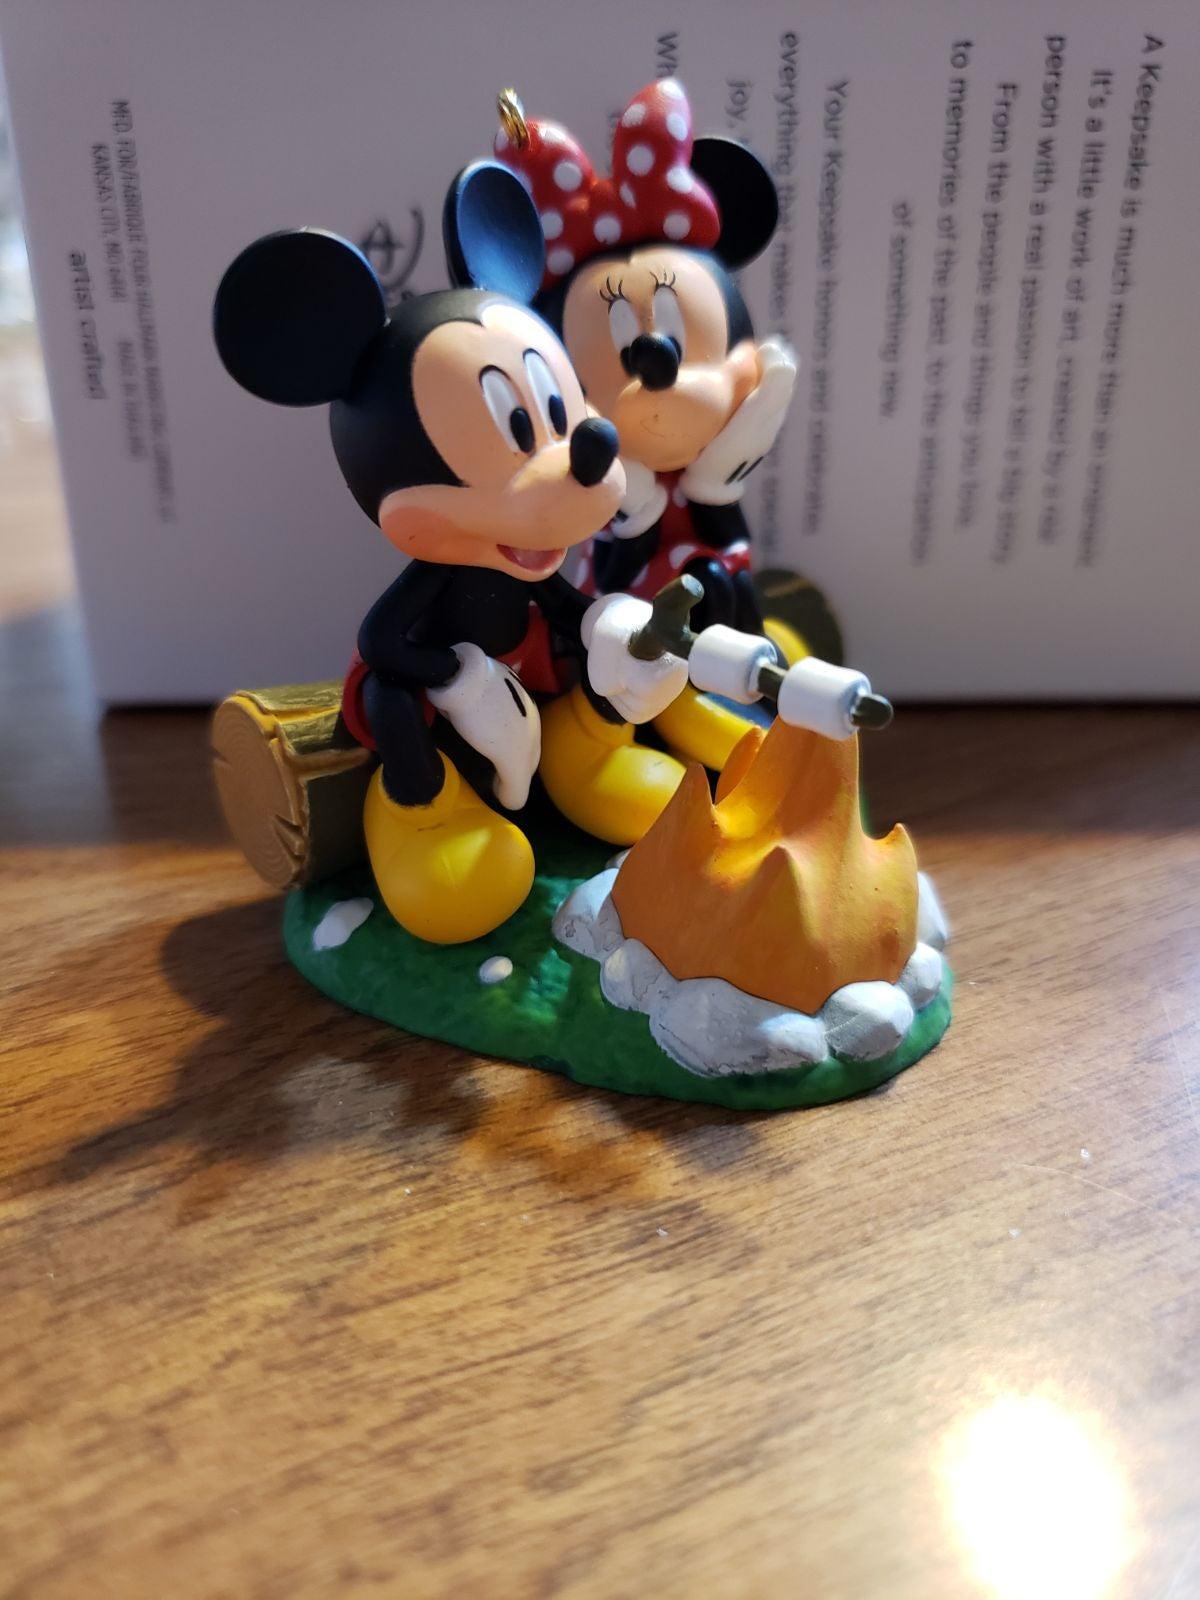 Hallmark 2019 Mickey & Minnie ornament